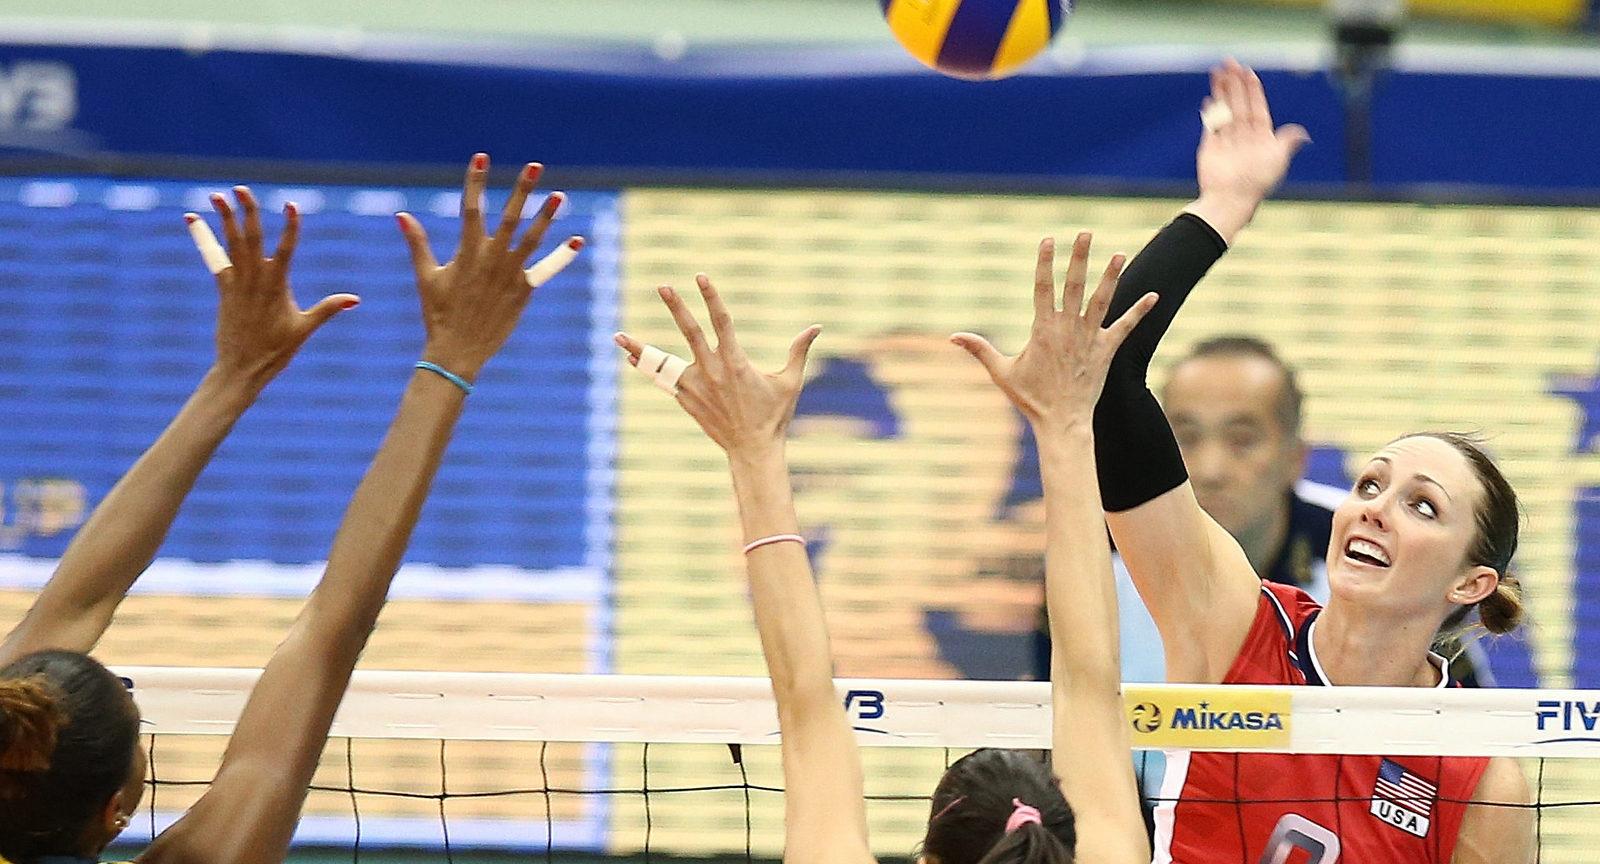 kristin richards hildebrand USA volleyball 4